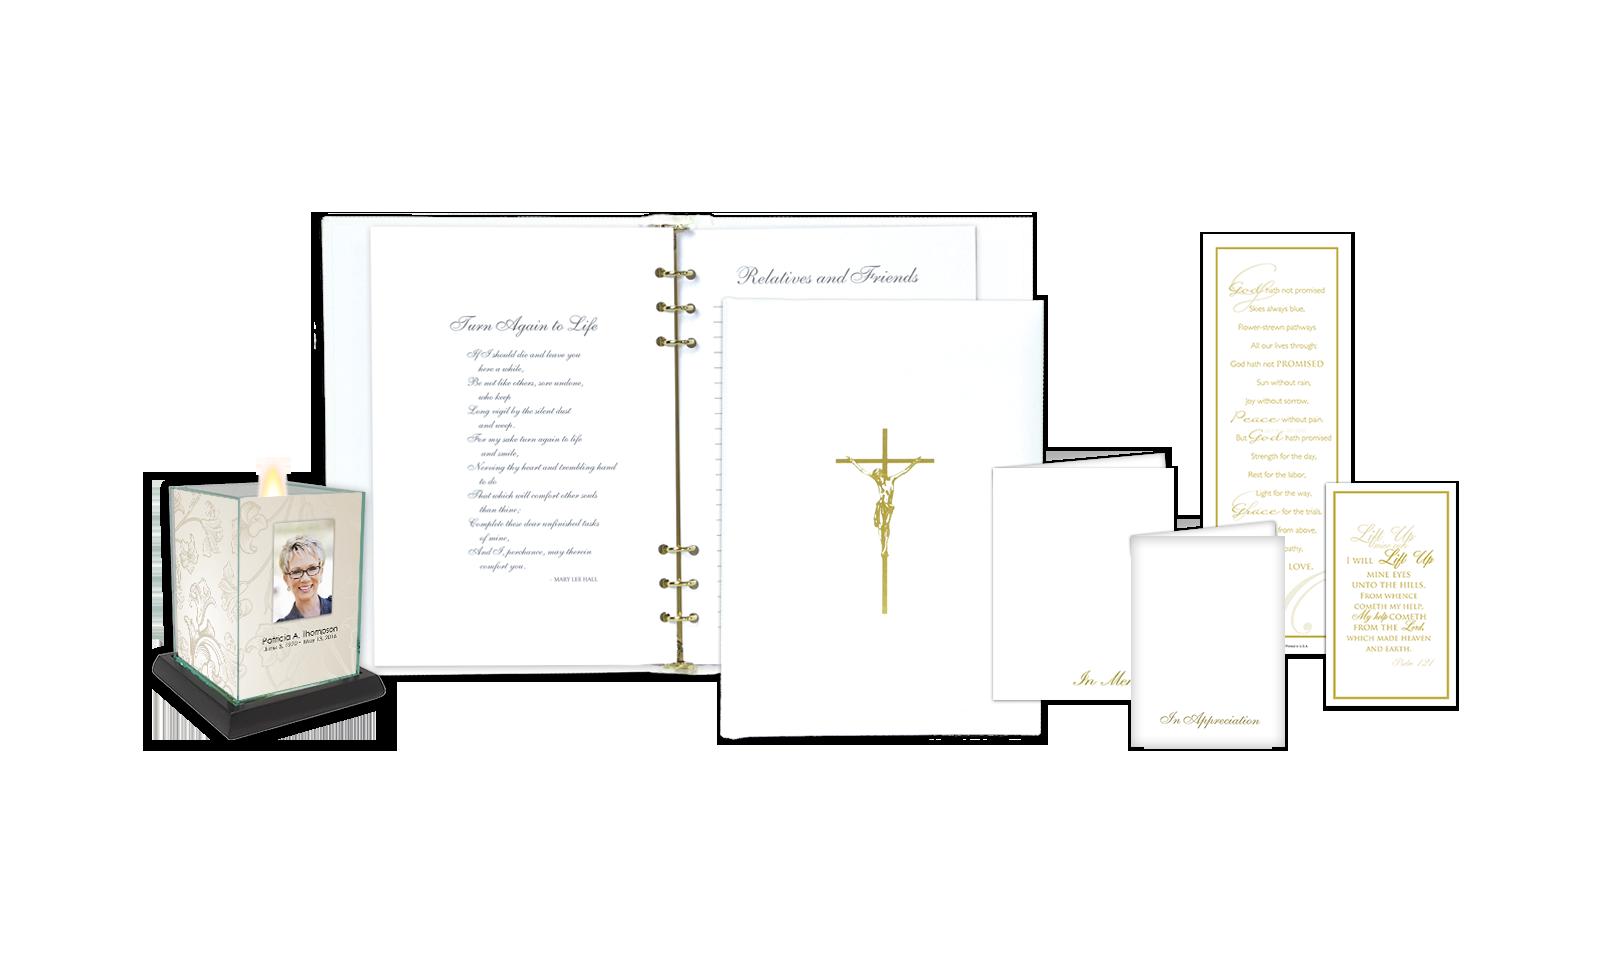 ROL Economy Line Crucifix Series 429 IC-LWT